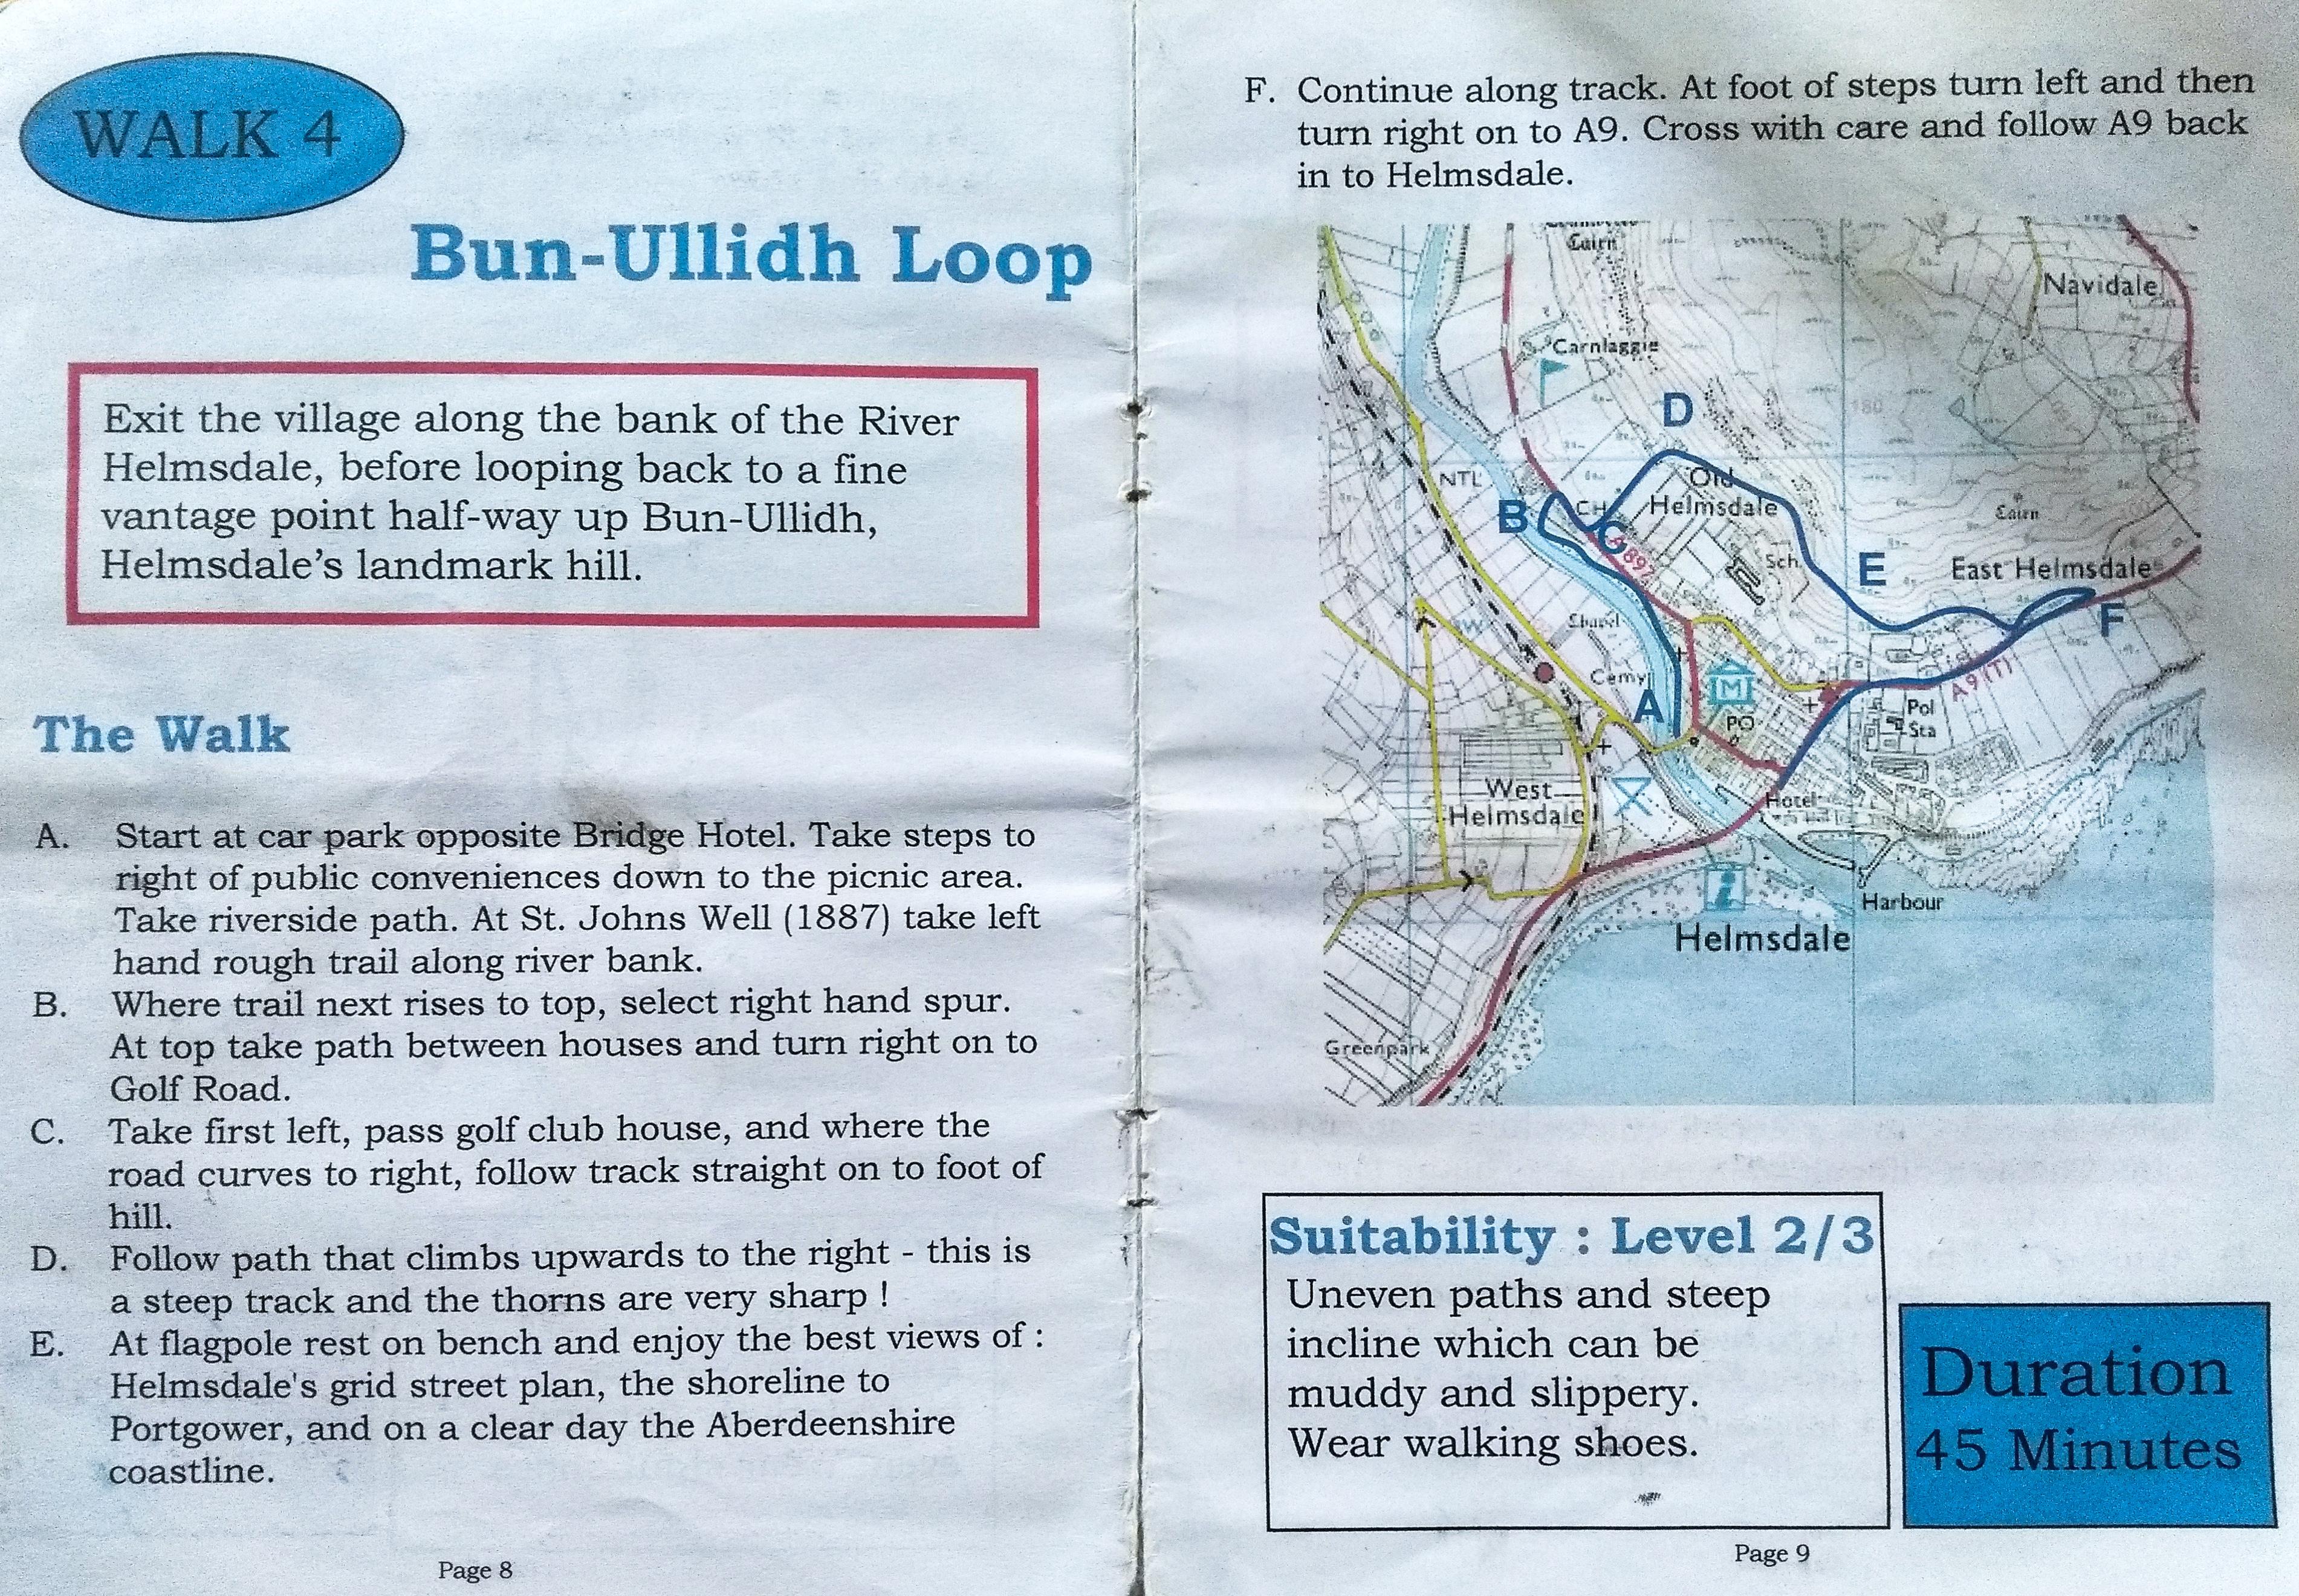 Wandertag Bun-Ullidhh